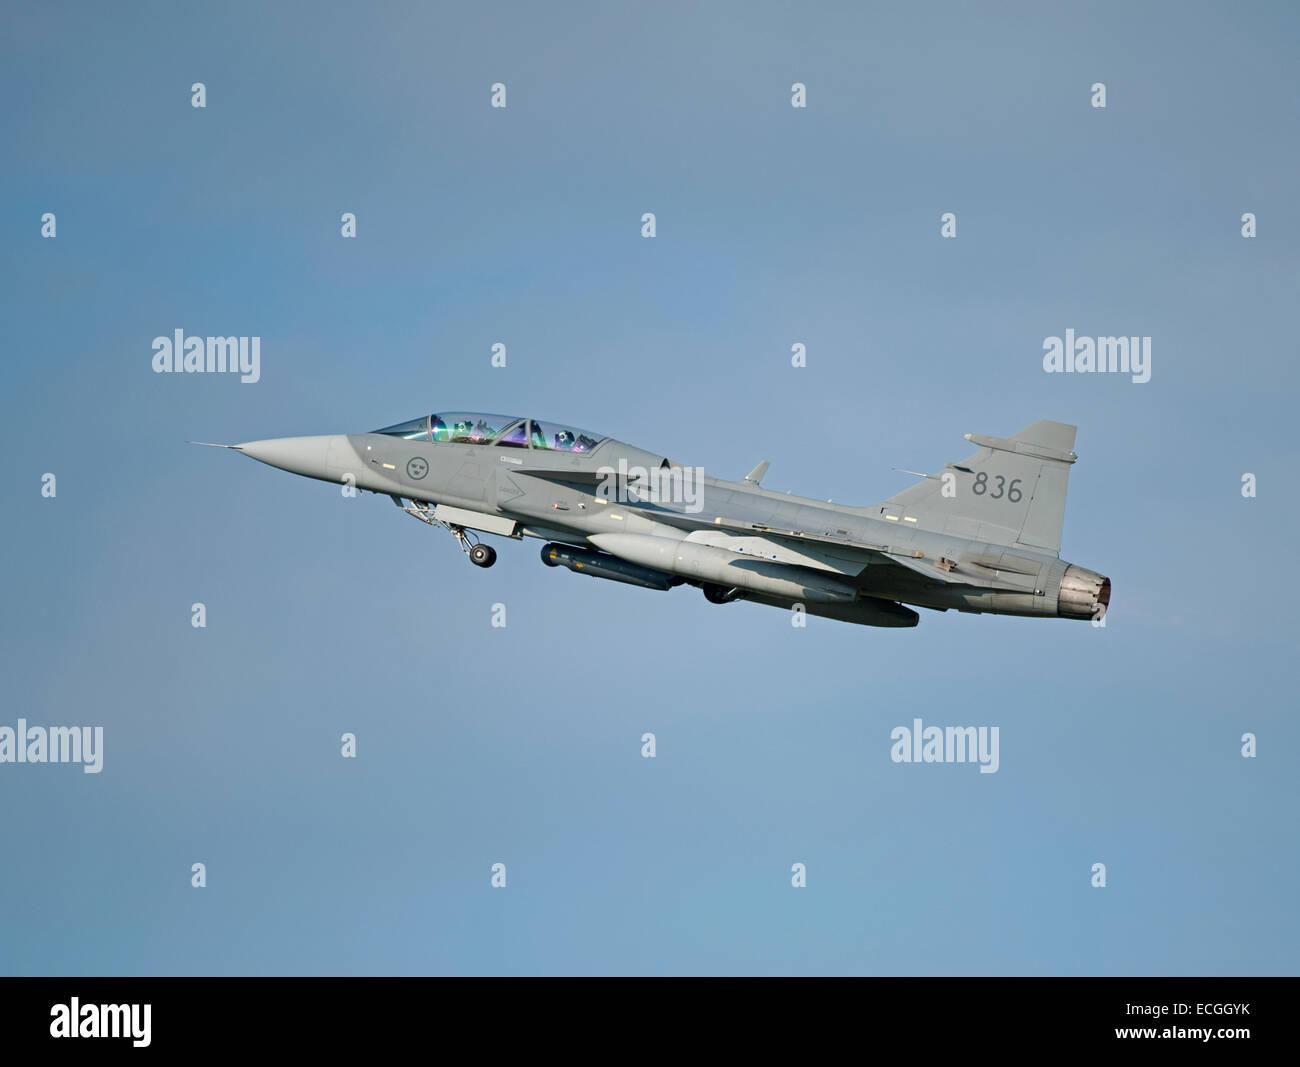 Swedish Saab Gripen No 836 on exercise at RAF Lossiemouth Scotland.  SCO 9349. - Stock Image